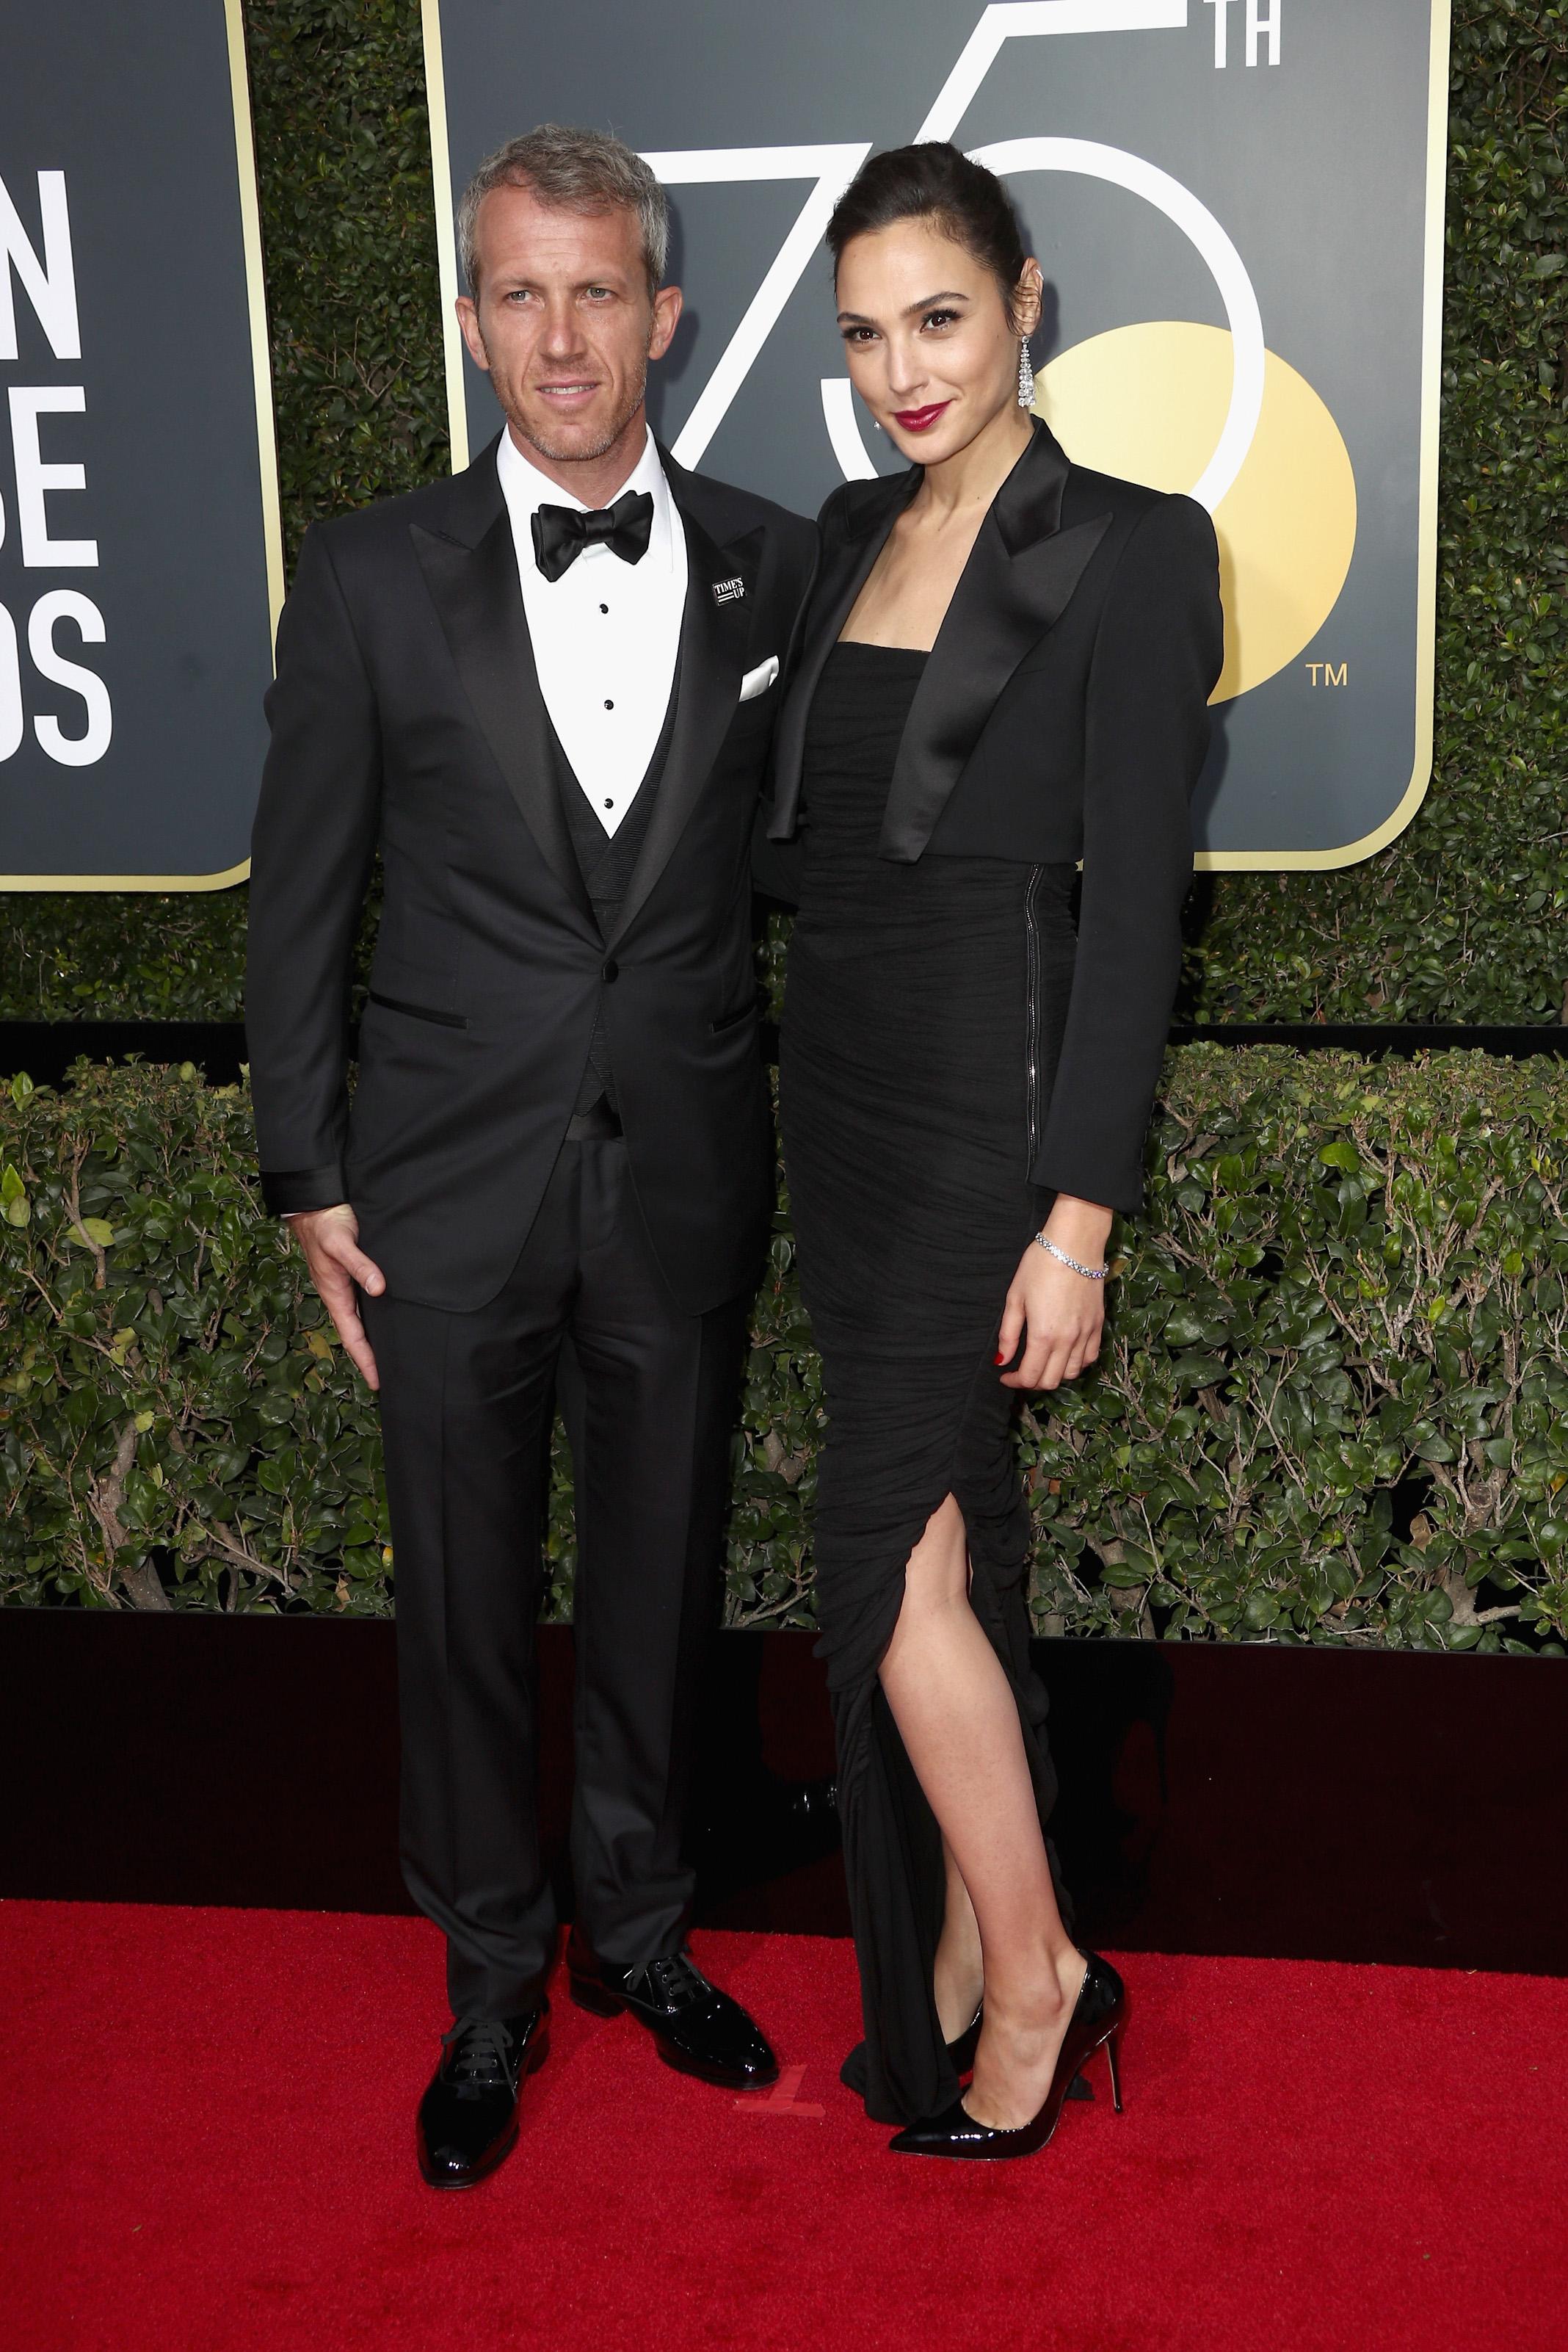 Gal Gadot and Yaron Versano 2018 Golden Globes